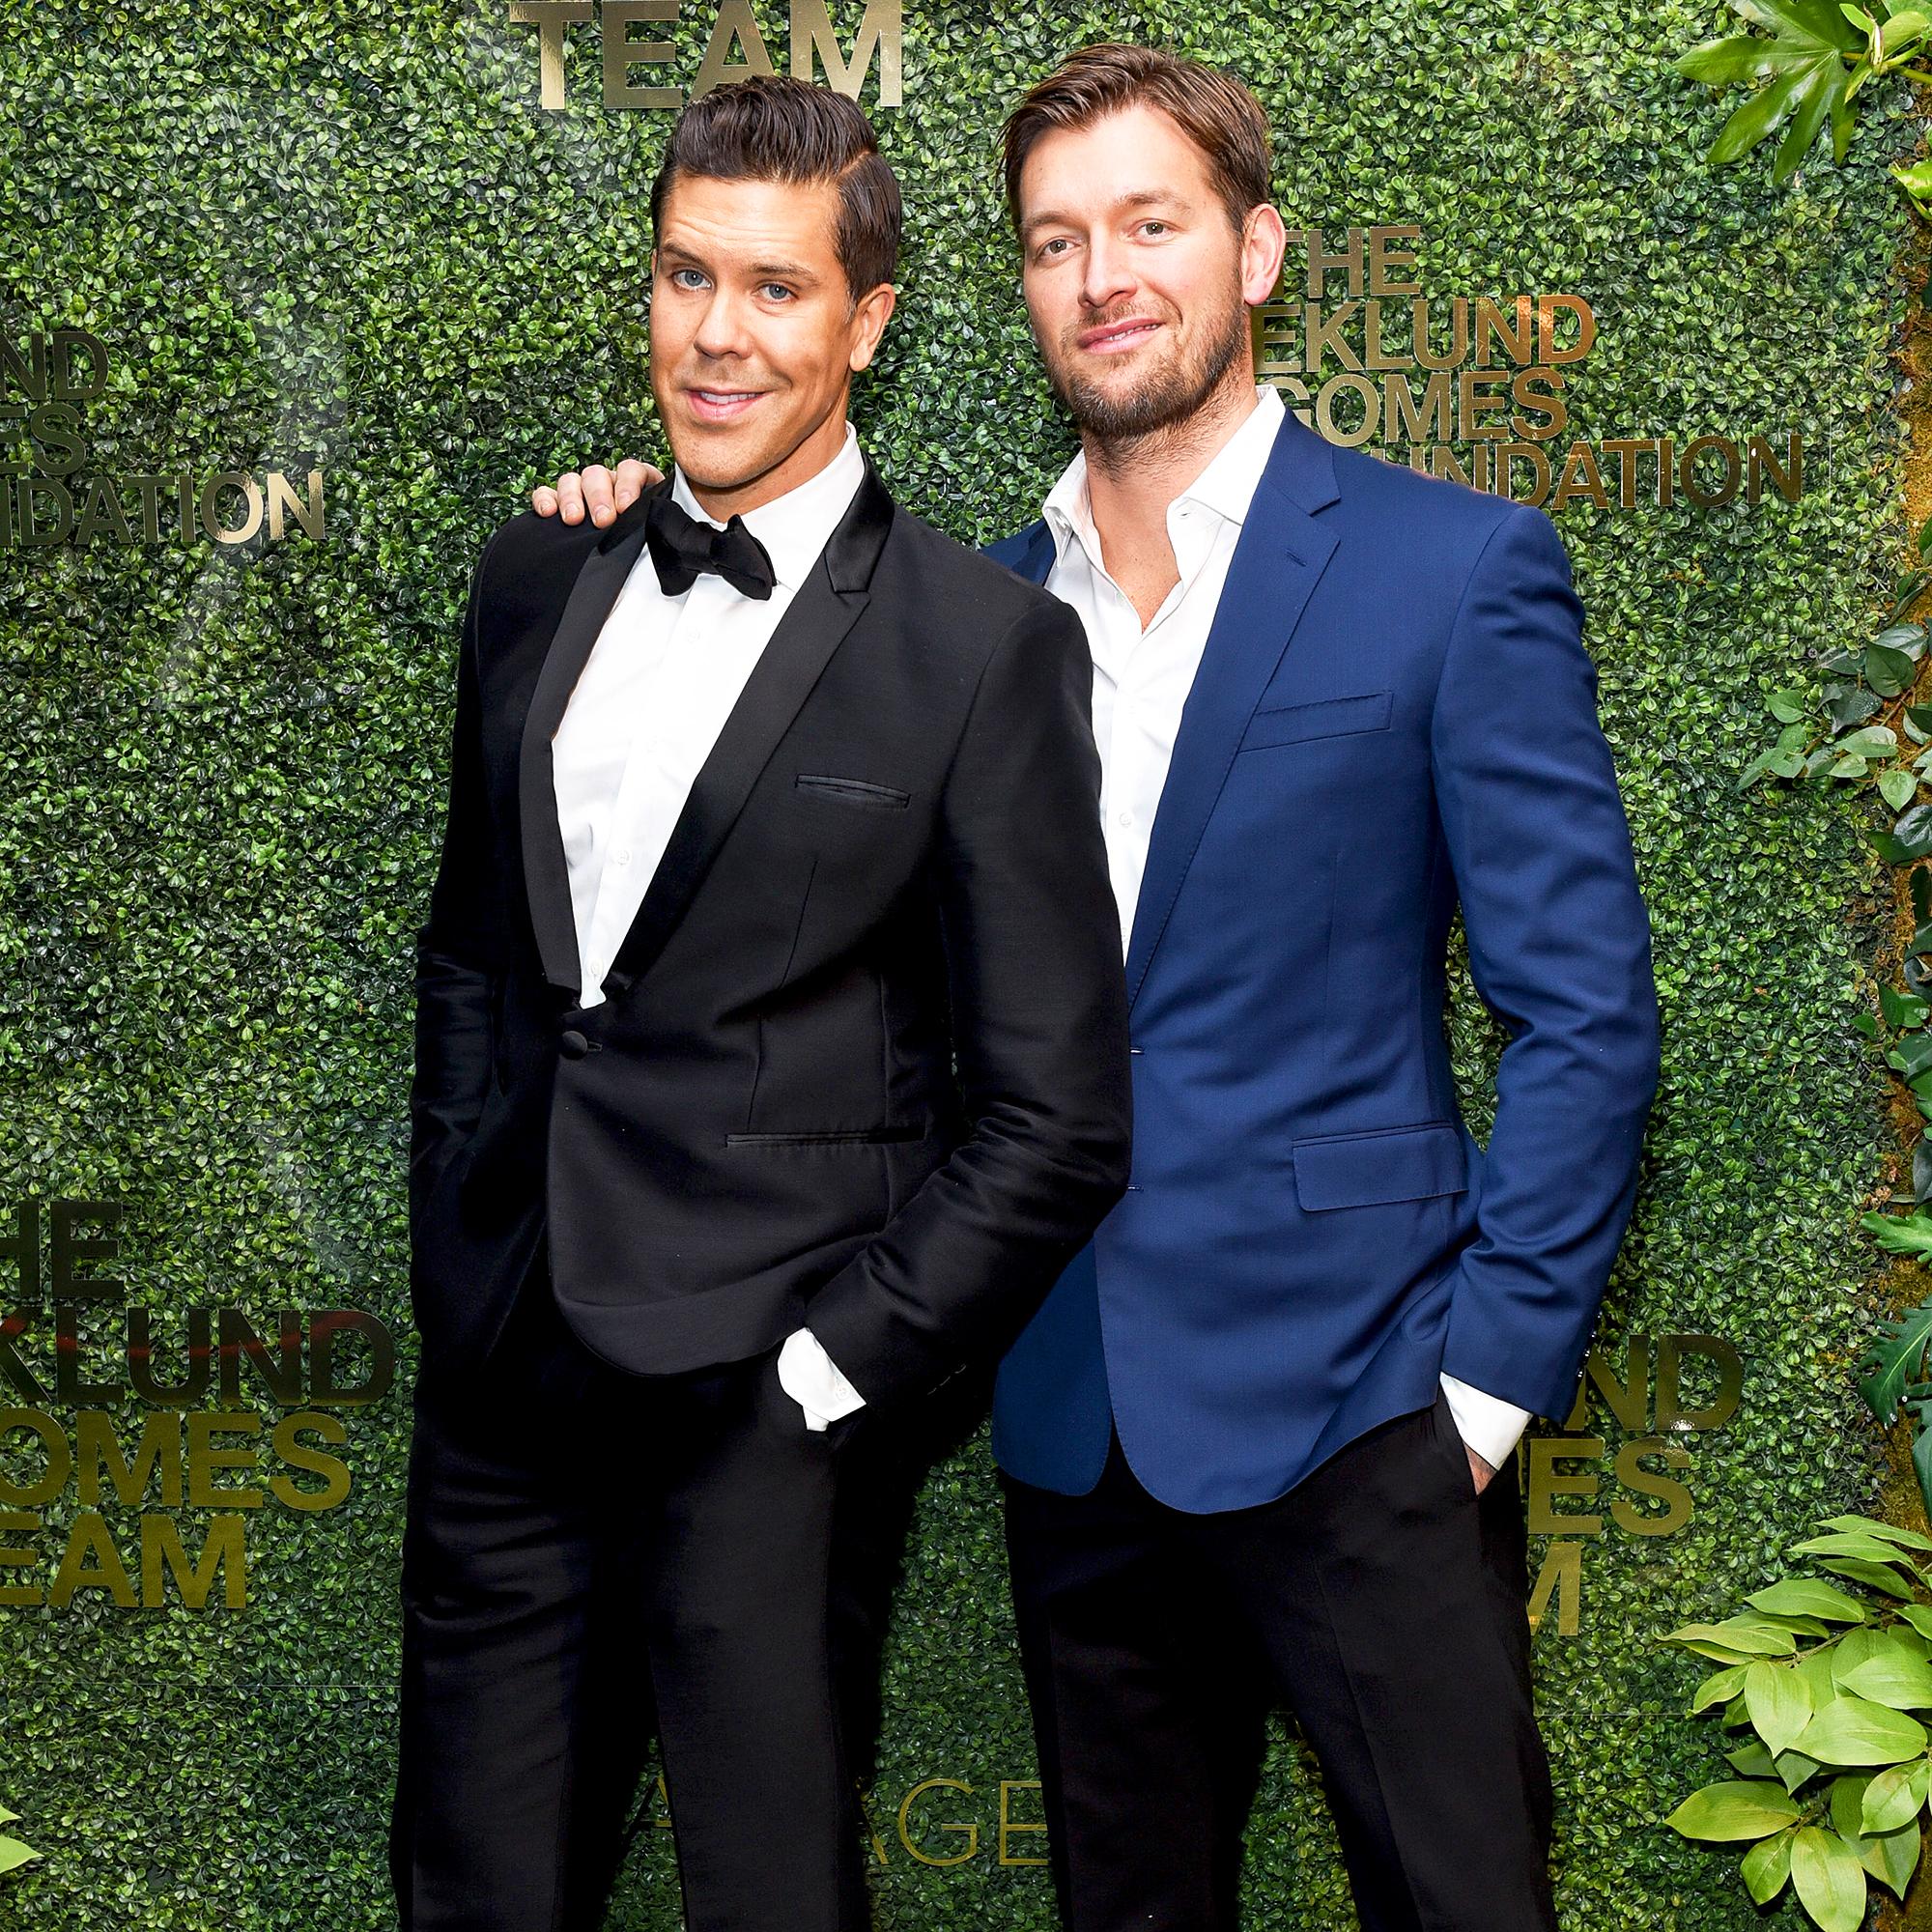 Fredrik Eklund and Derek Kaplan